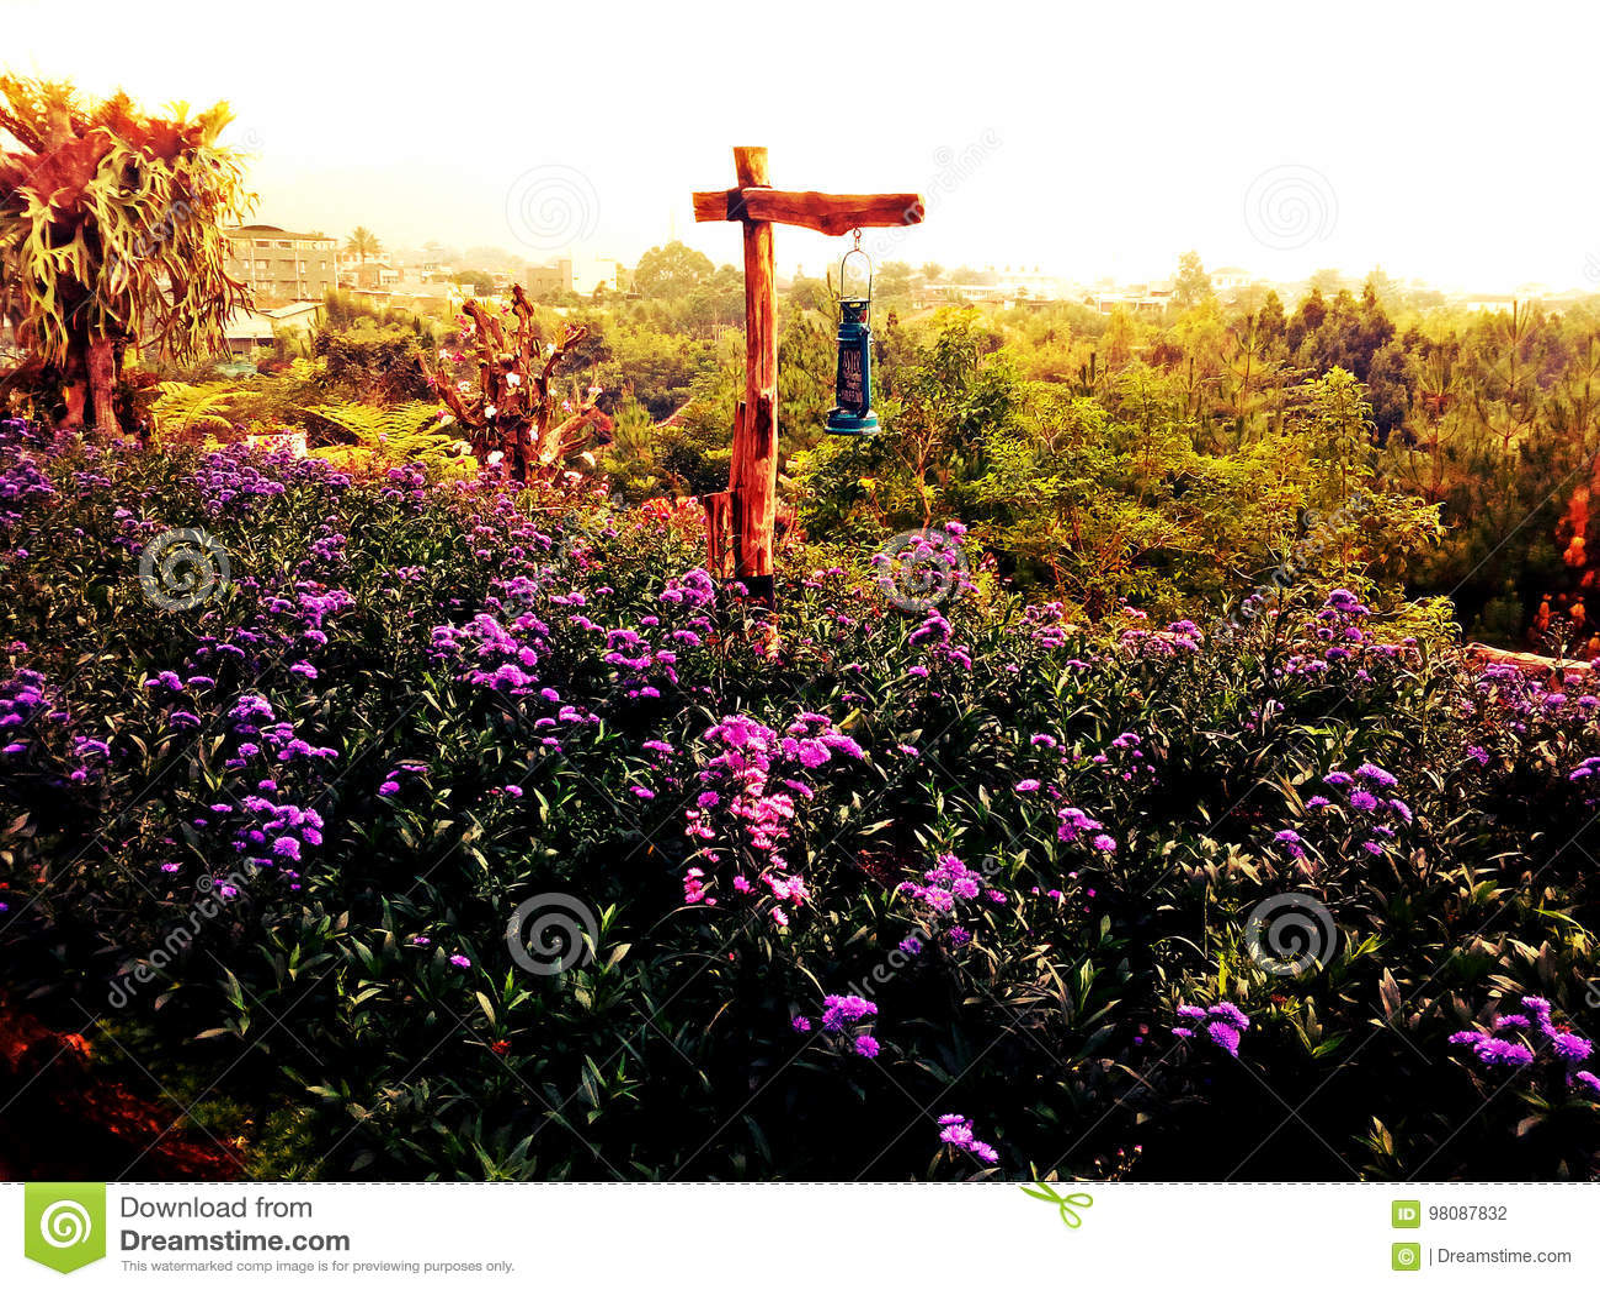 Rainbow Garden stock photo. Image of bandung, java, garden ...